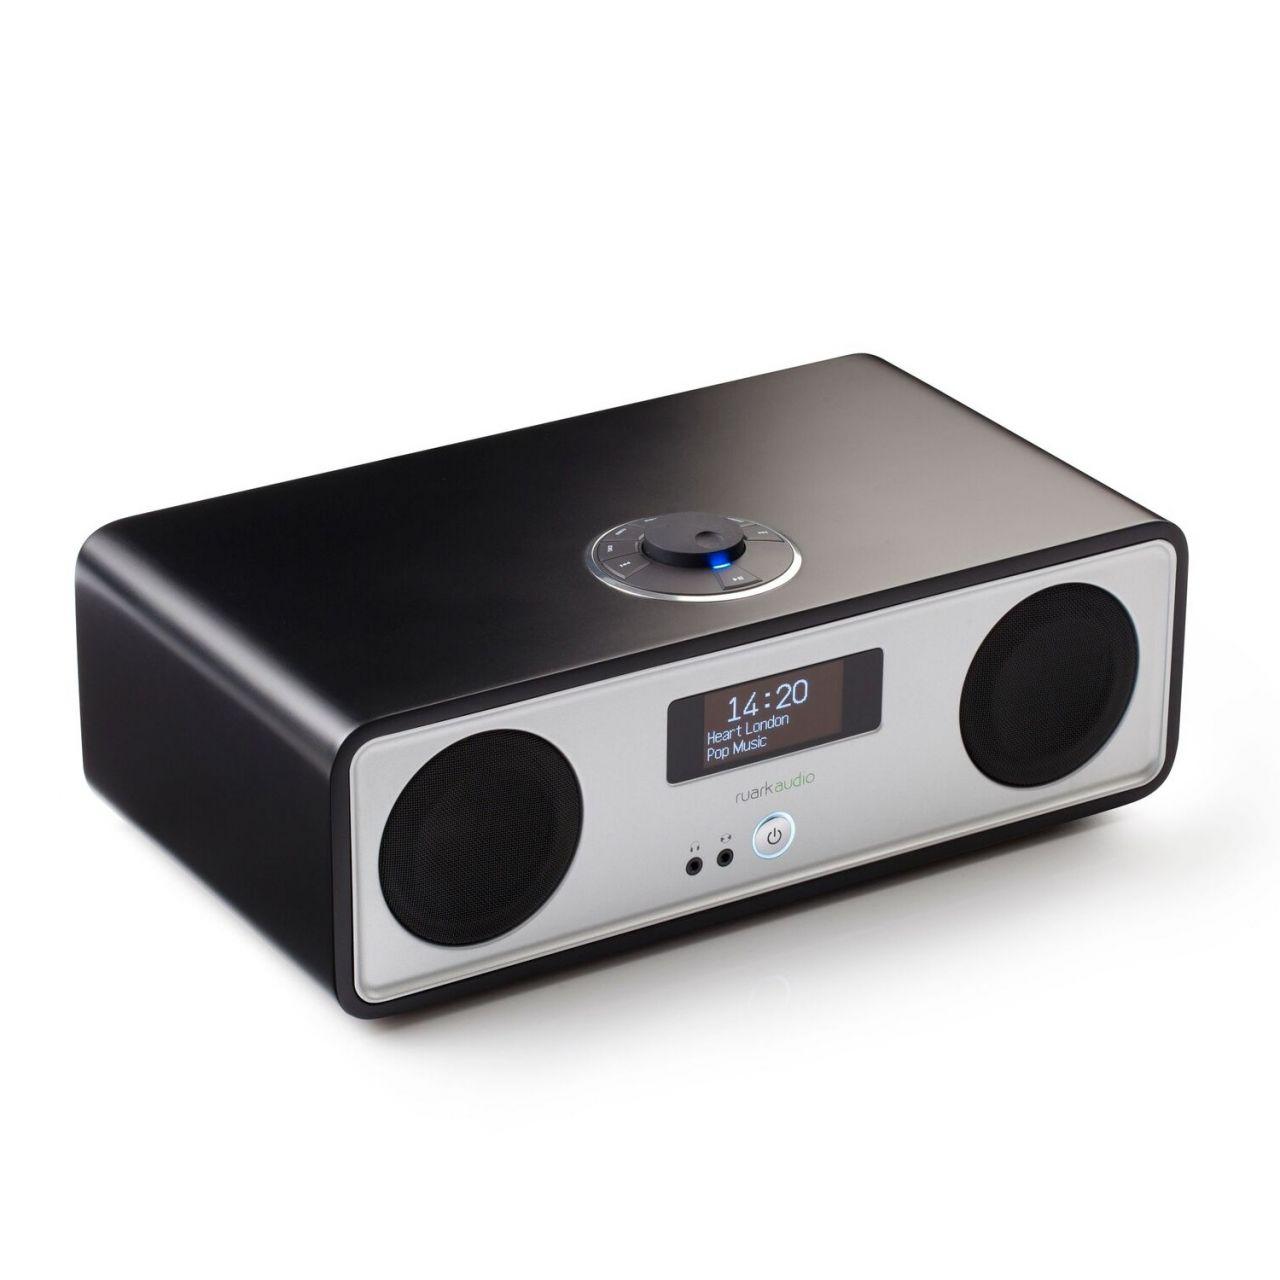 ruark audio - Stereoradio R2 9020